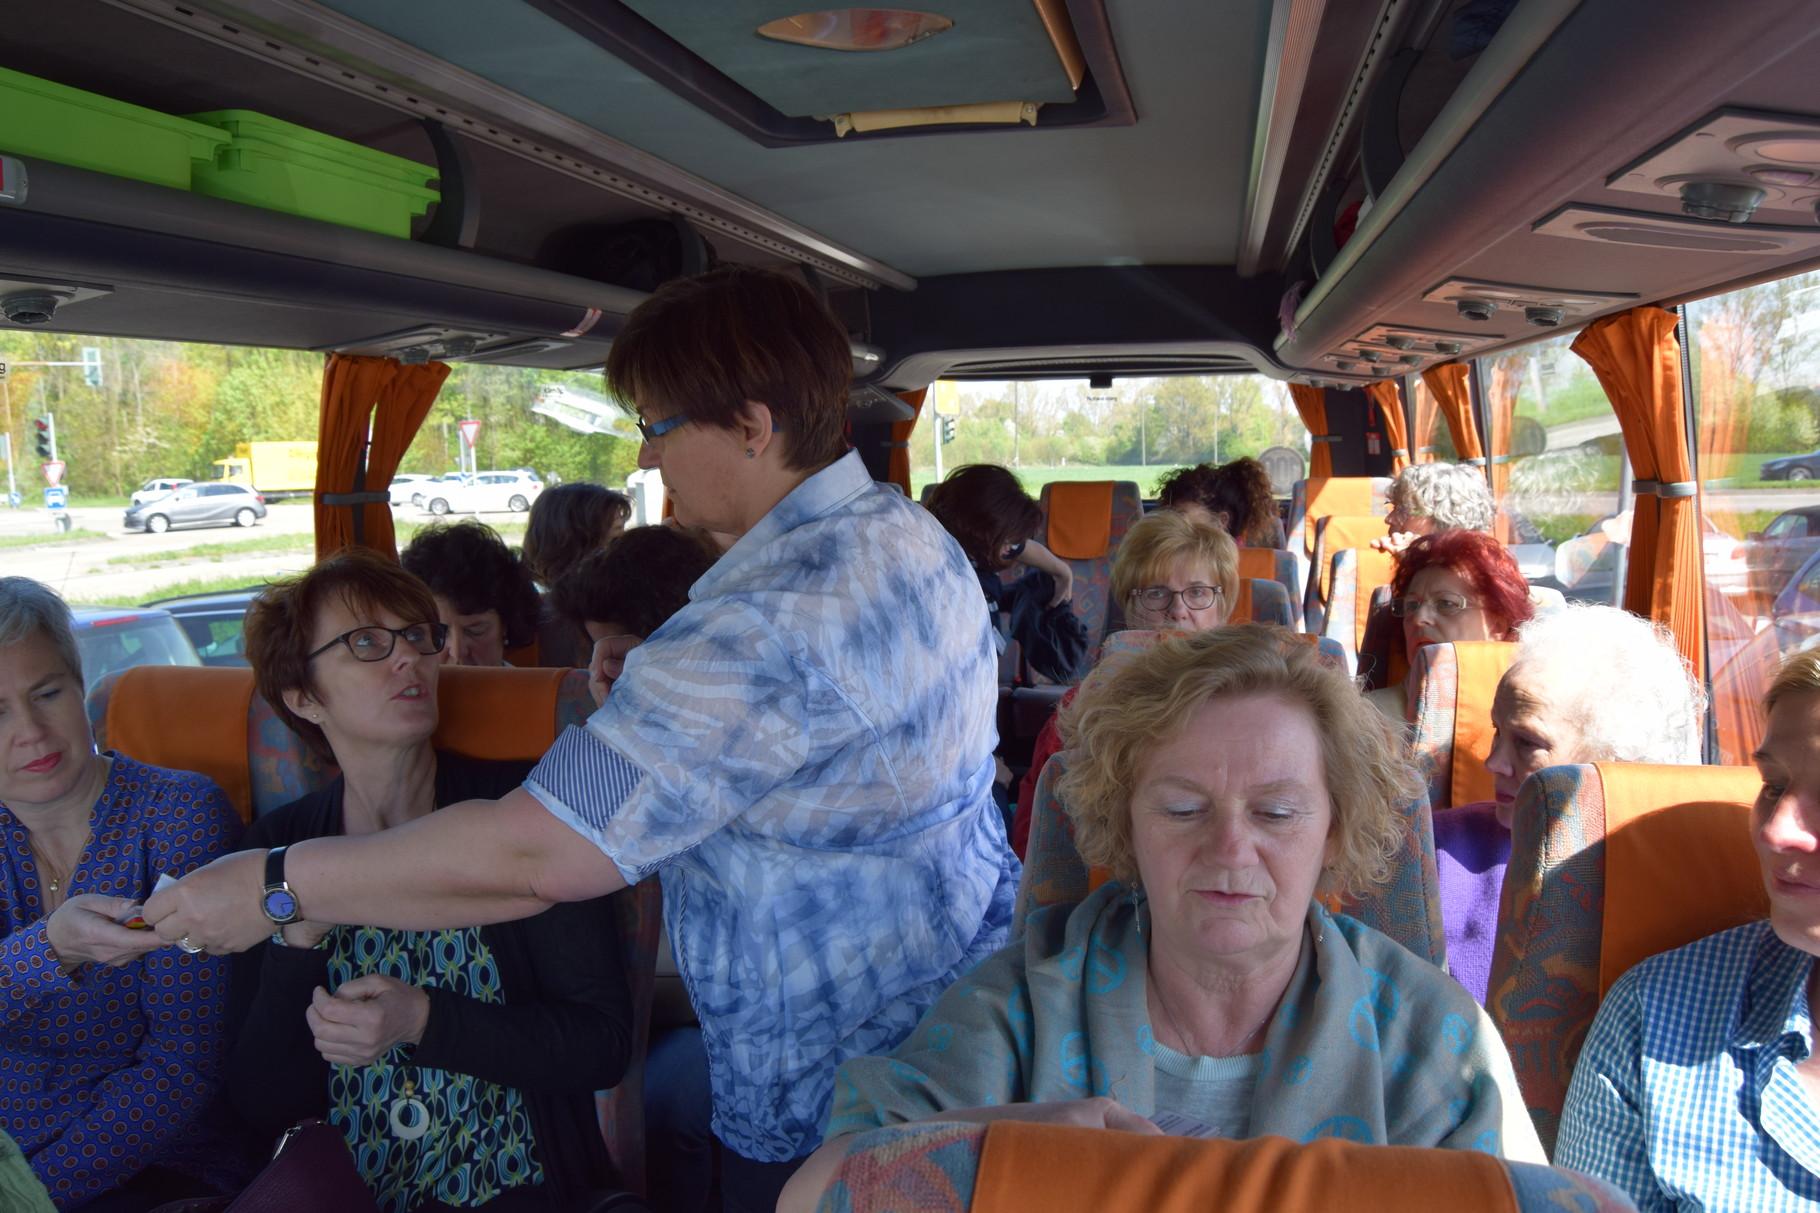 ufh Forum 04-16 Fahrt nach Calw